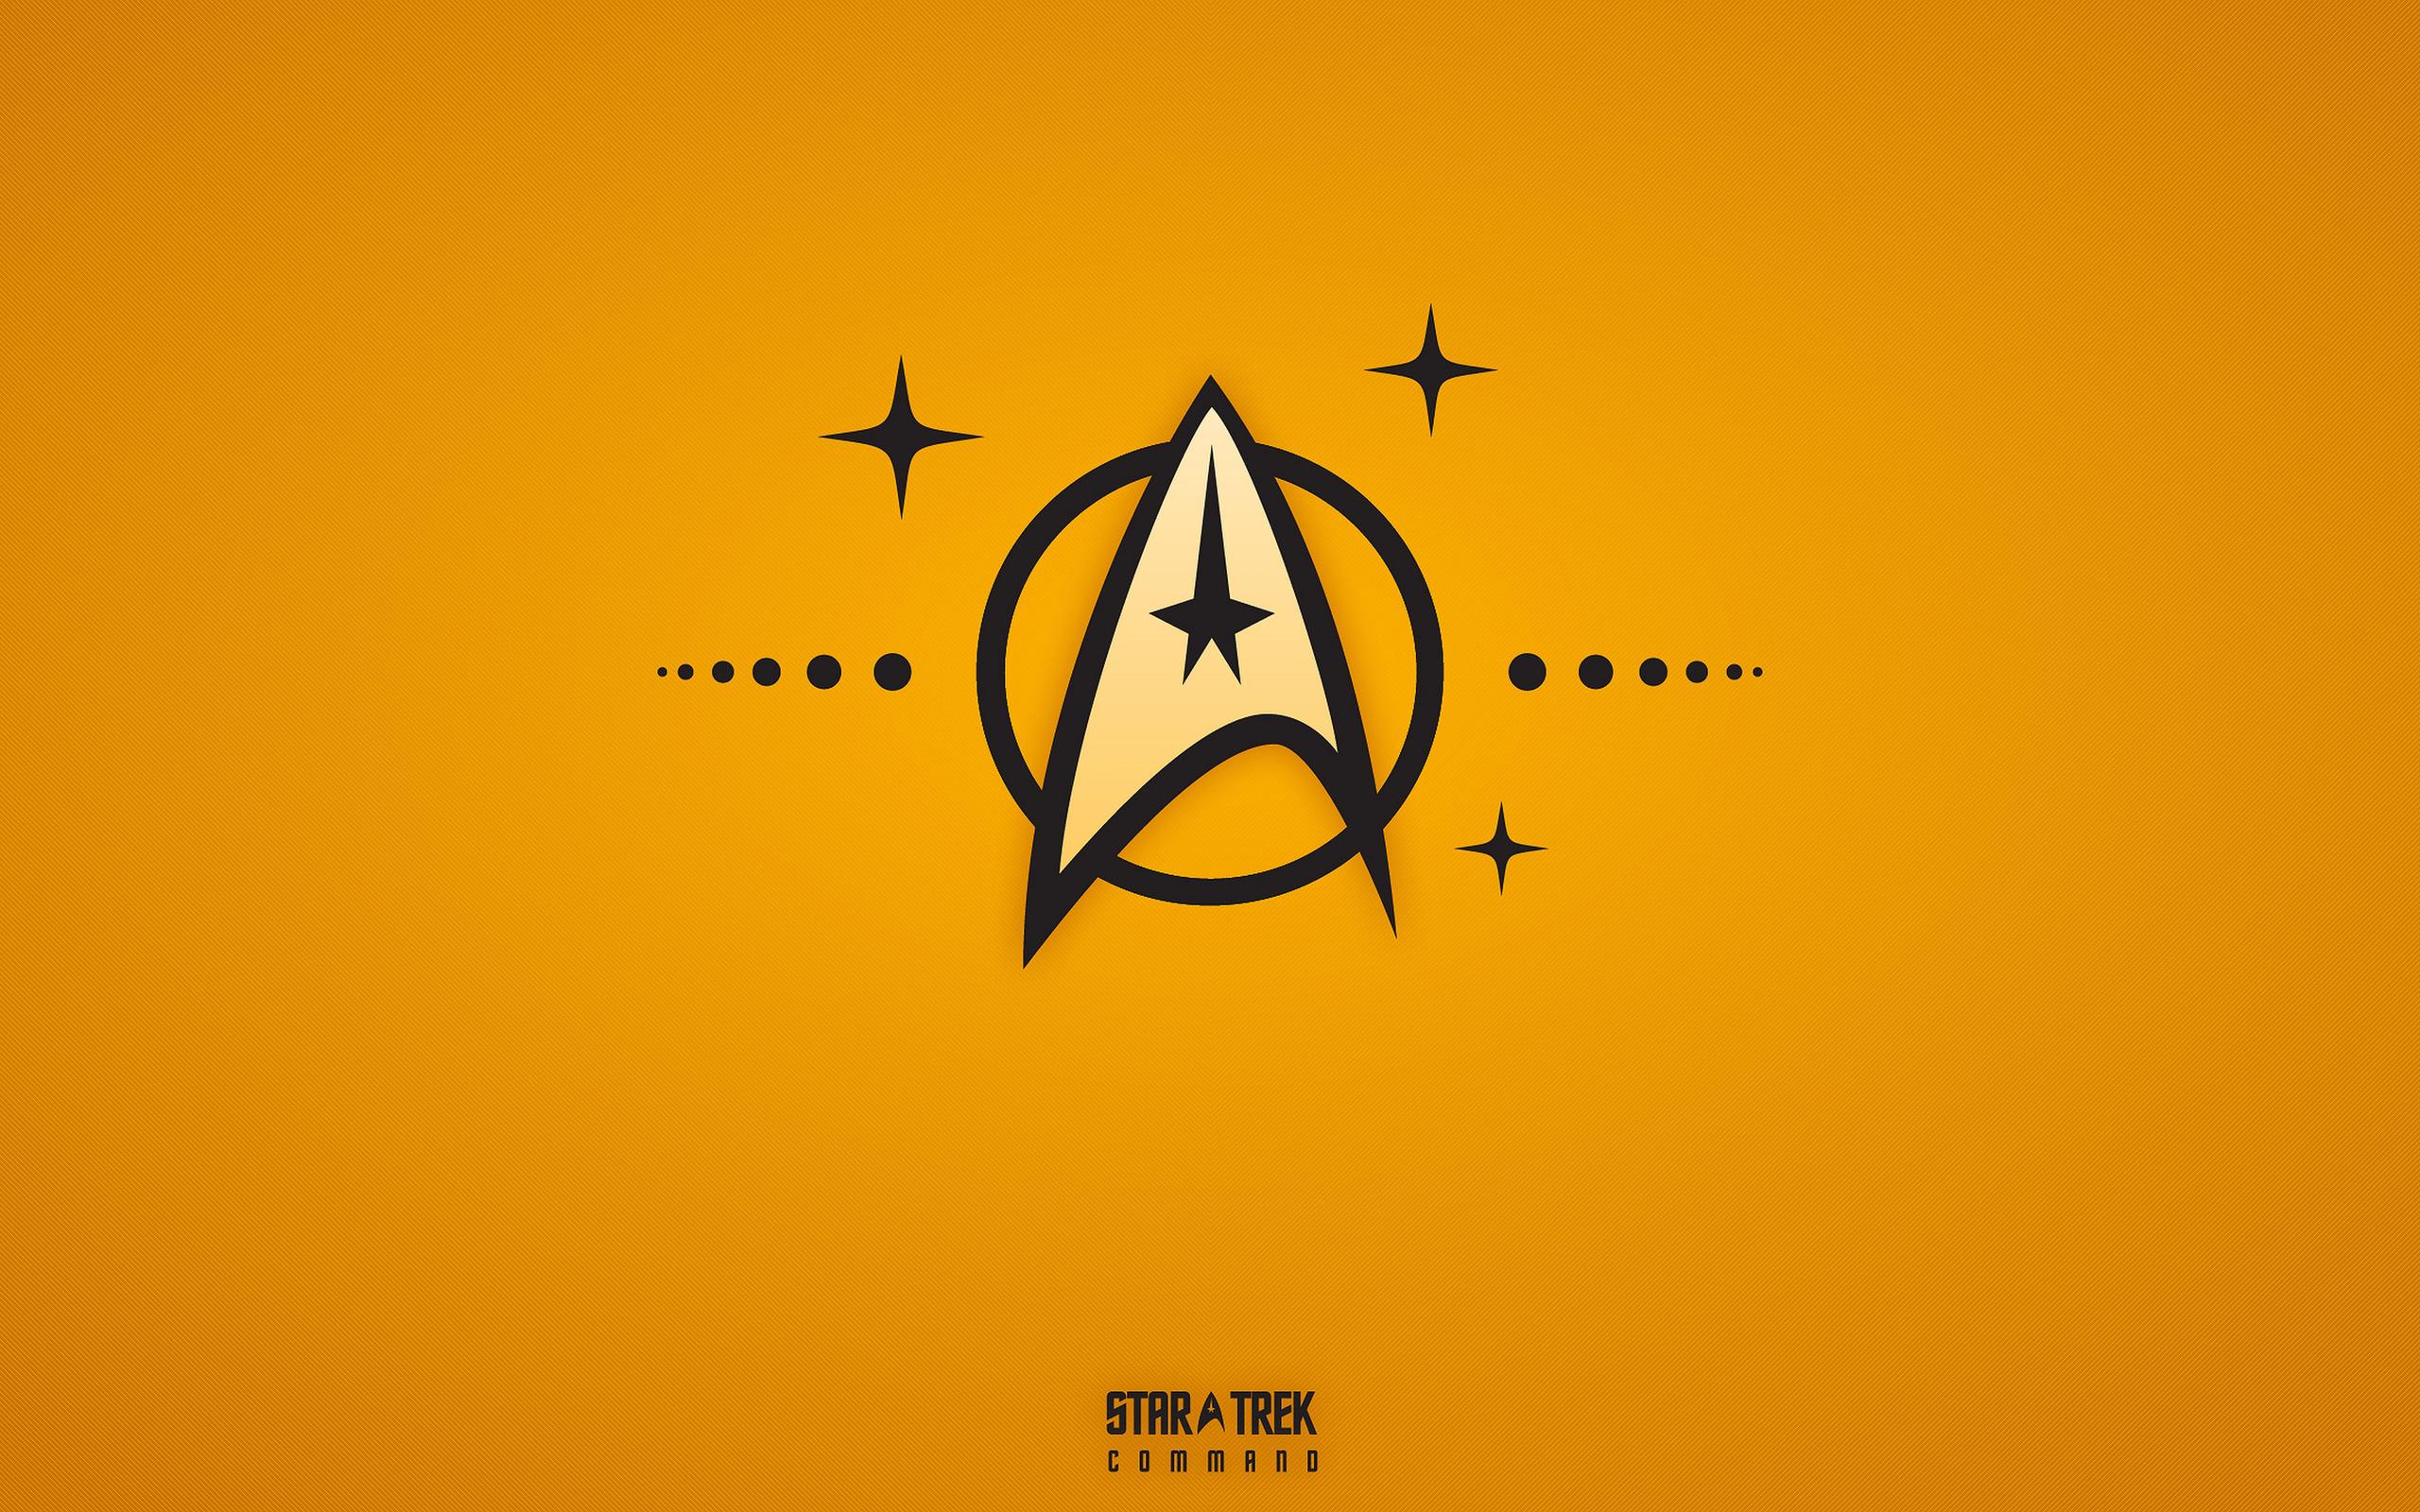 star trek starfleet command wallpaper - photo #2